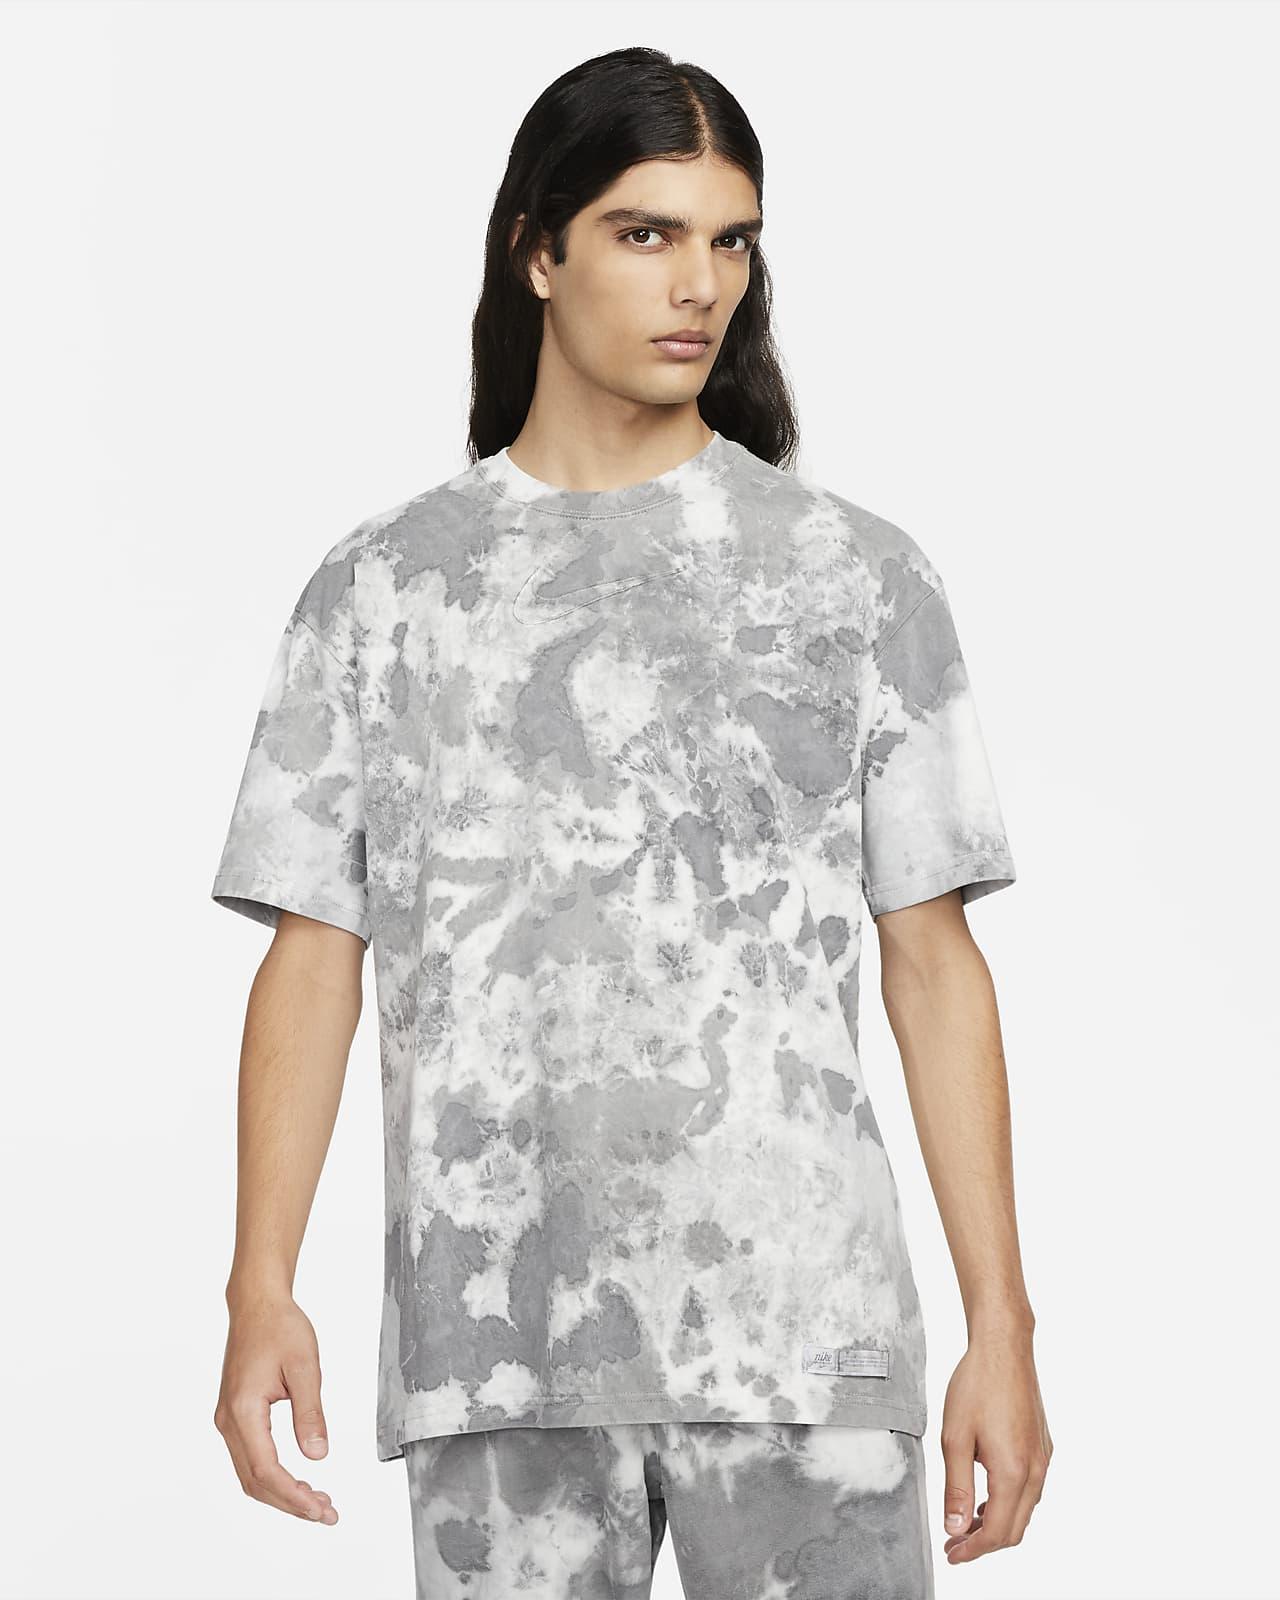 Nike Sportswear Max 90 Men's T-Shirt